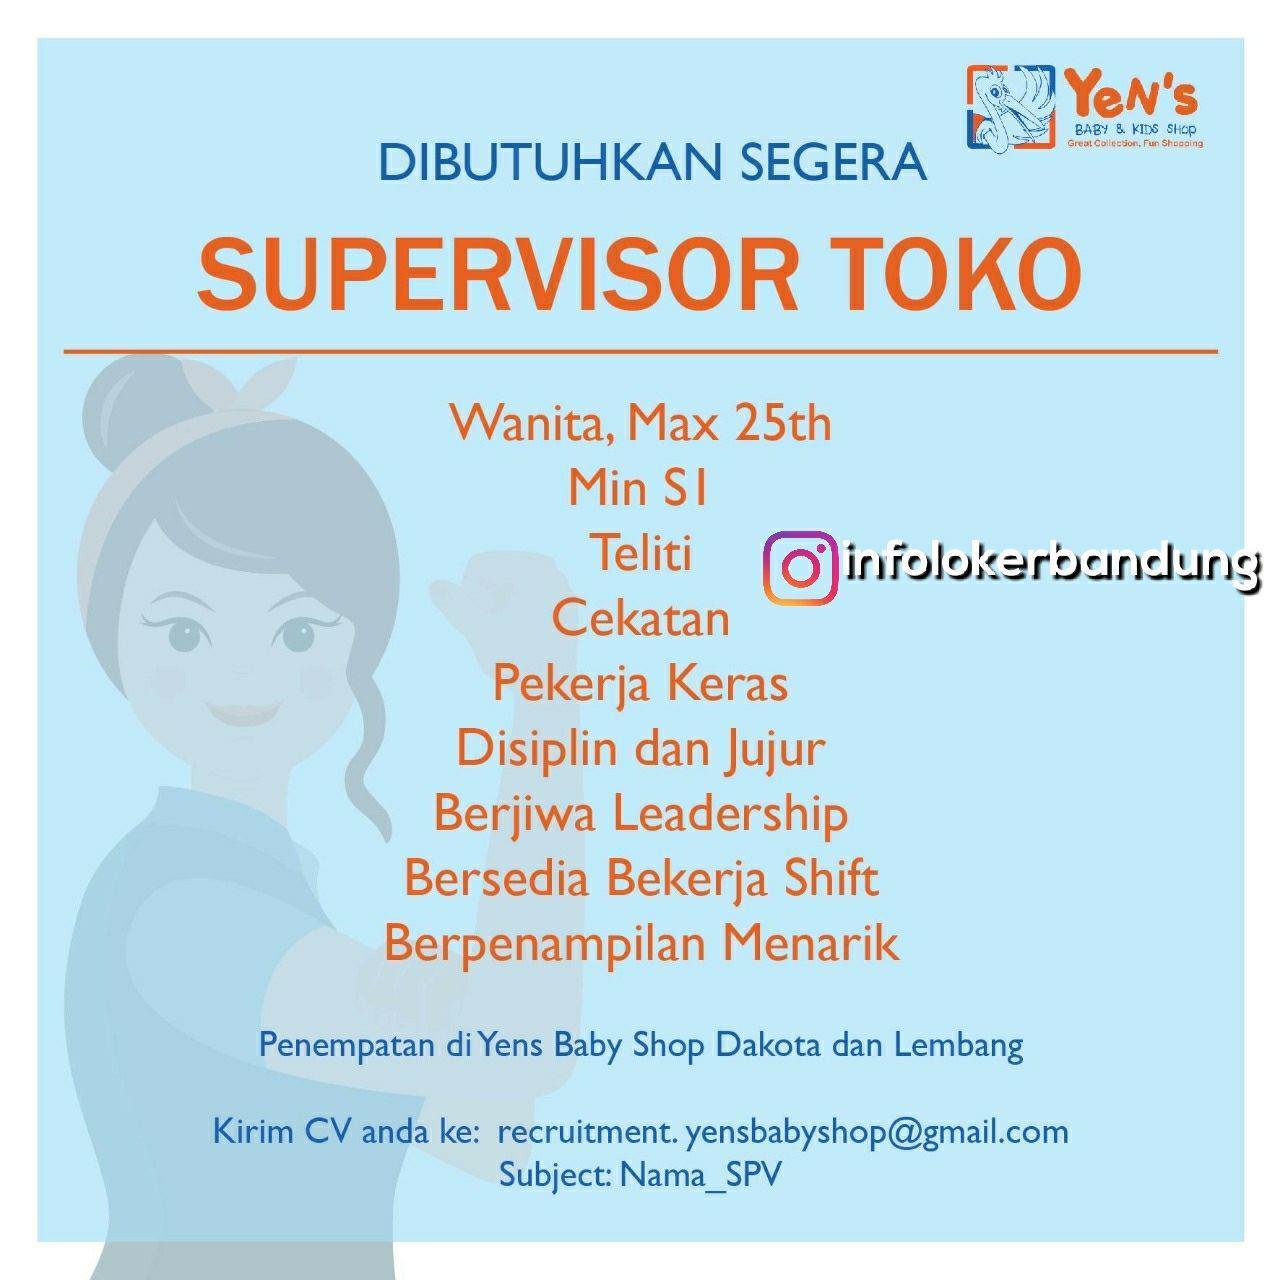 Lowongan Kerja Yens Baby & Kids Shop Bandung Januari 2018